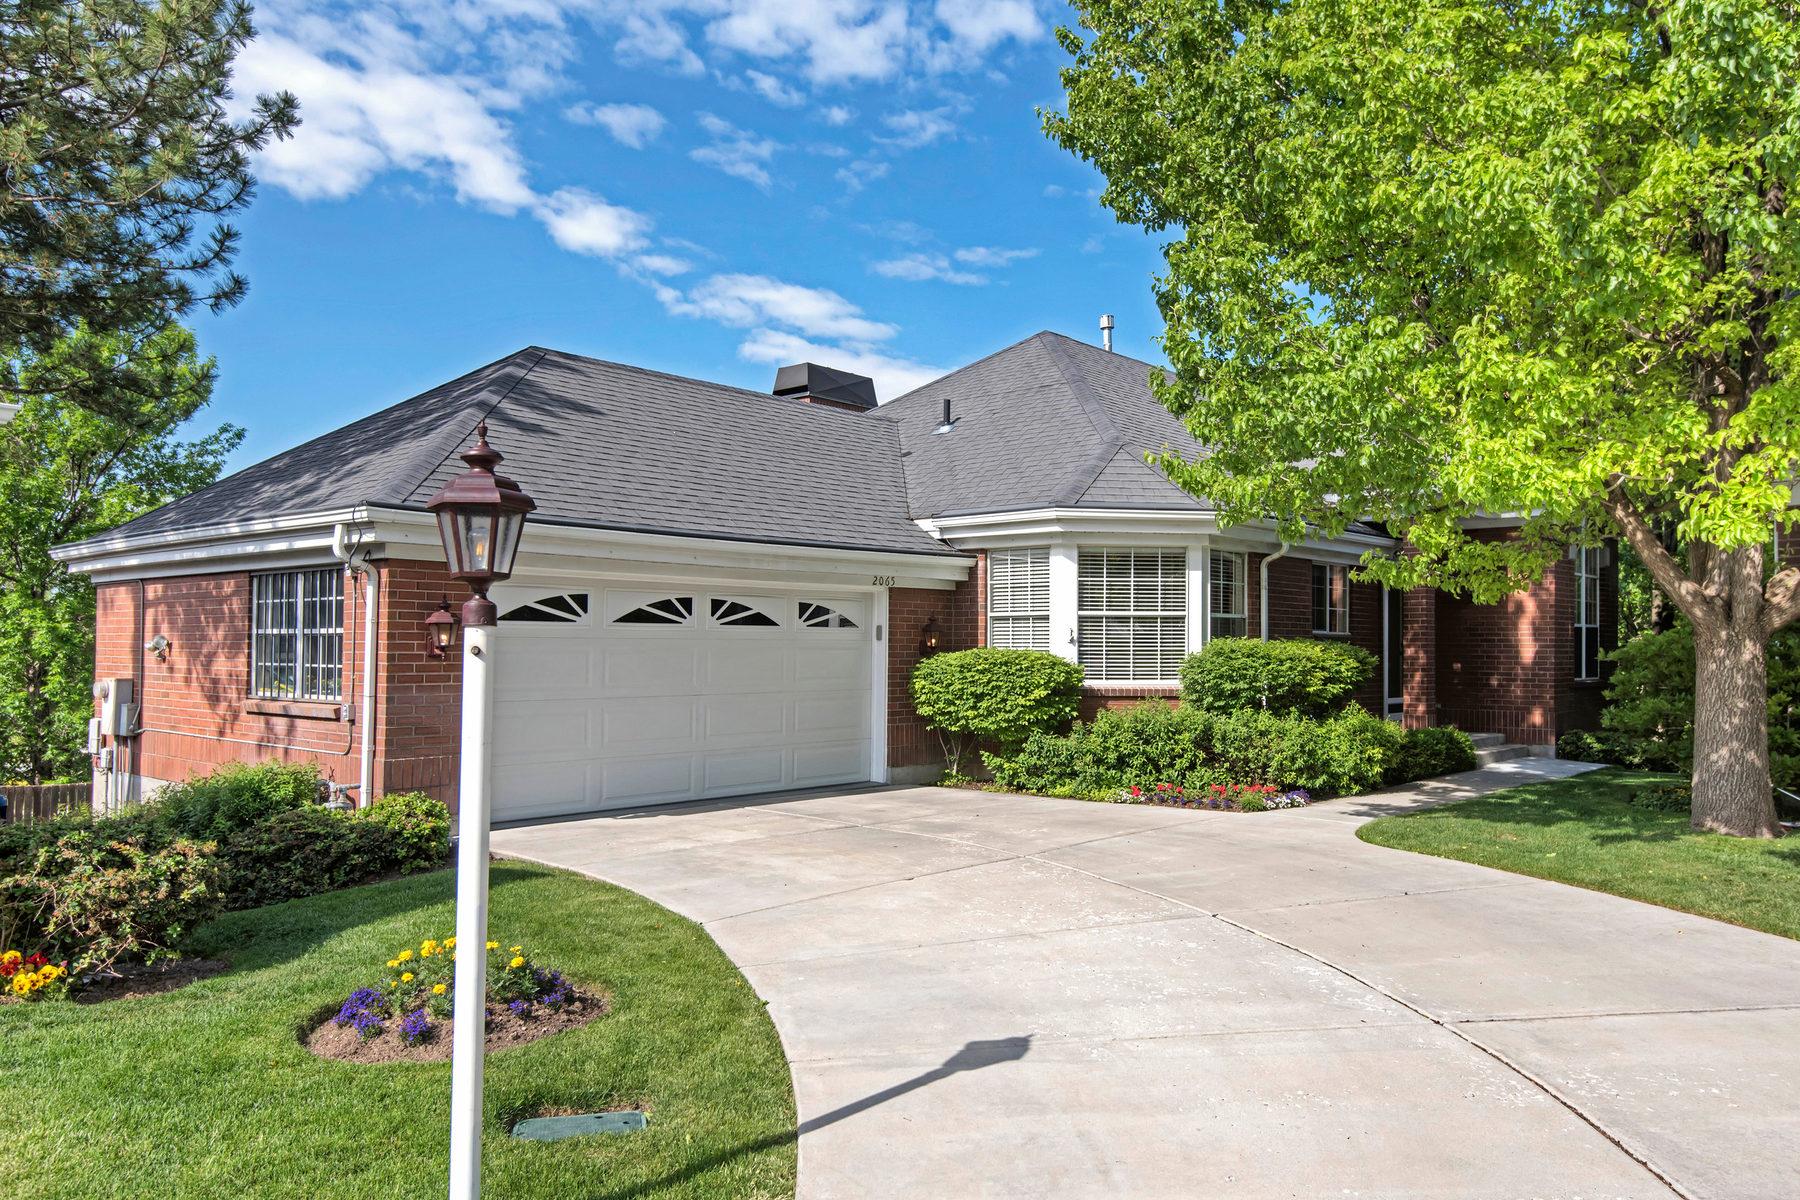 Villa per Vendita alle ore Emigration Creek Side Harvard Oaks Home 2065 E Harvard Oaks Cir Salt Lake City, Utah, 84108 Stati Uniti